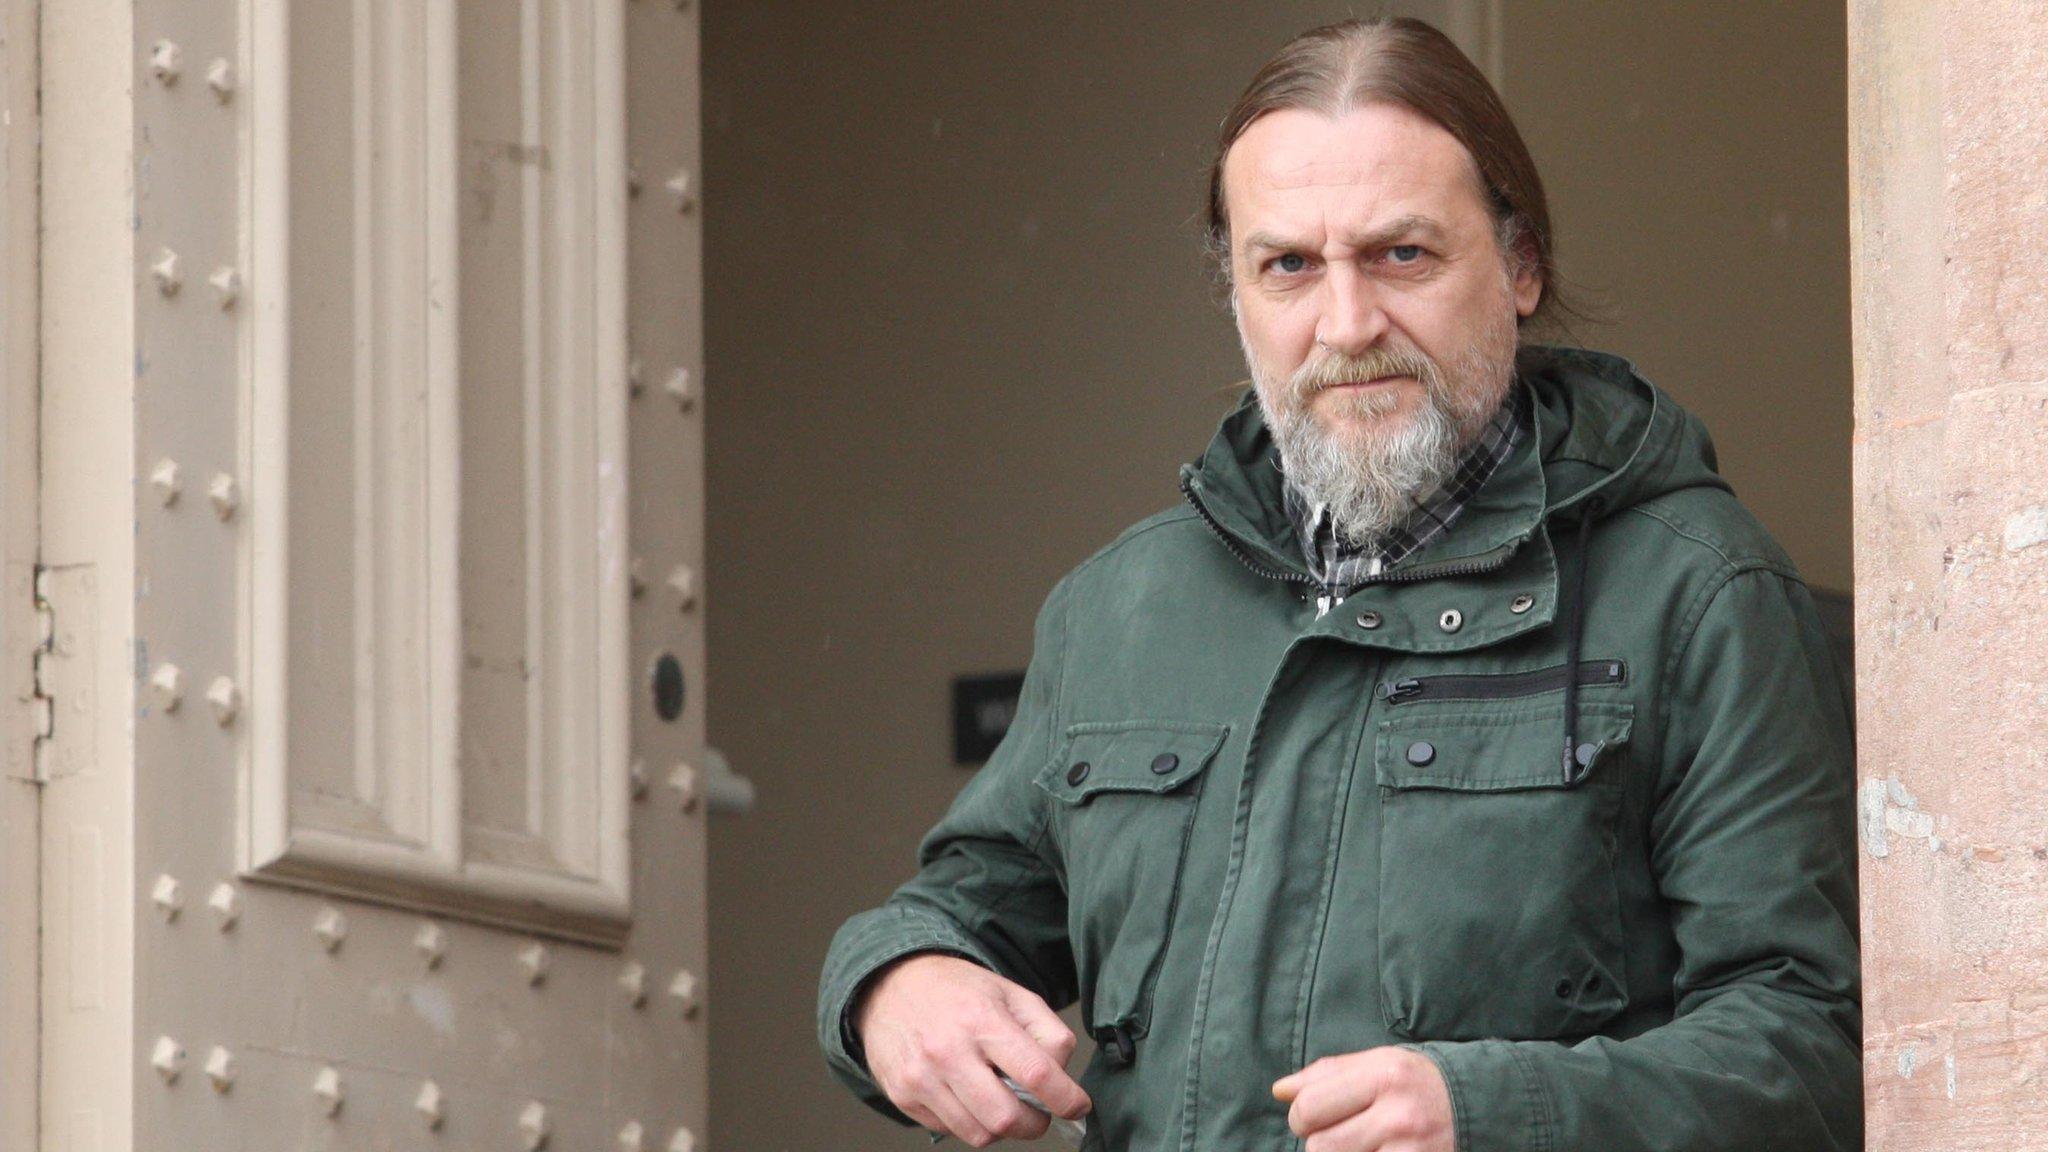 Man who kept owl heads in jam jars fined